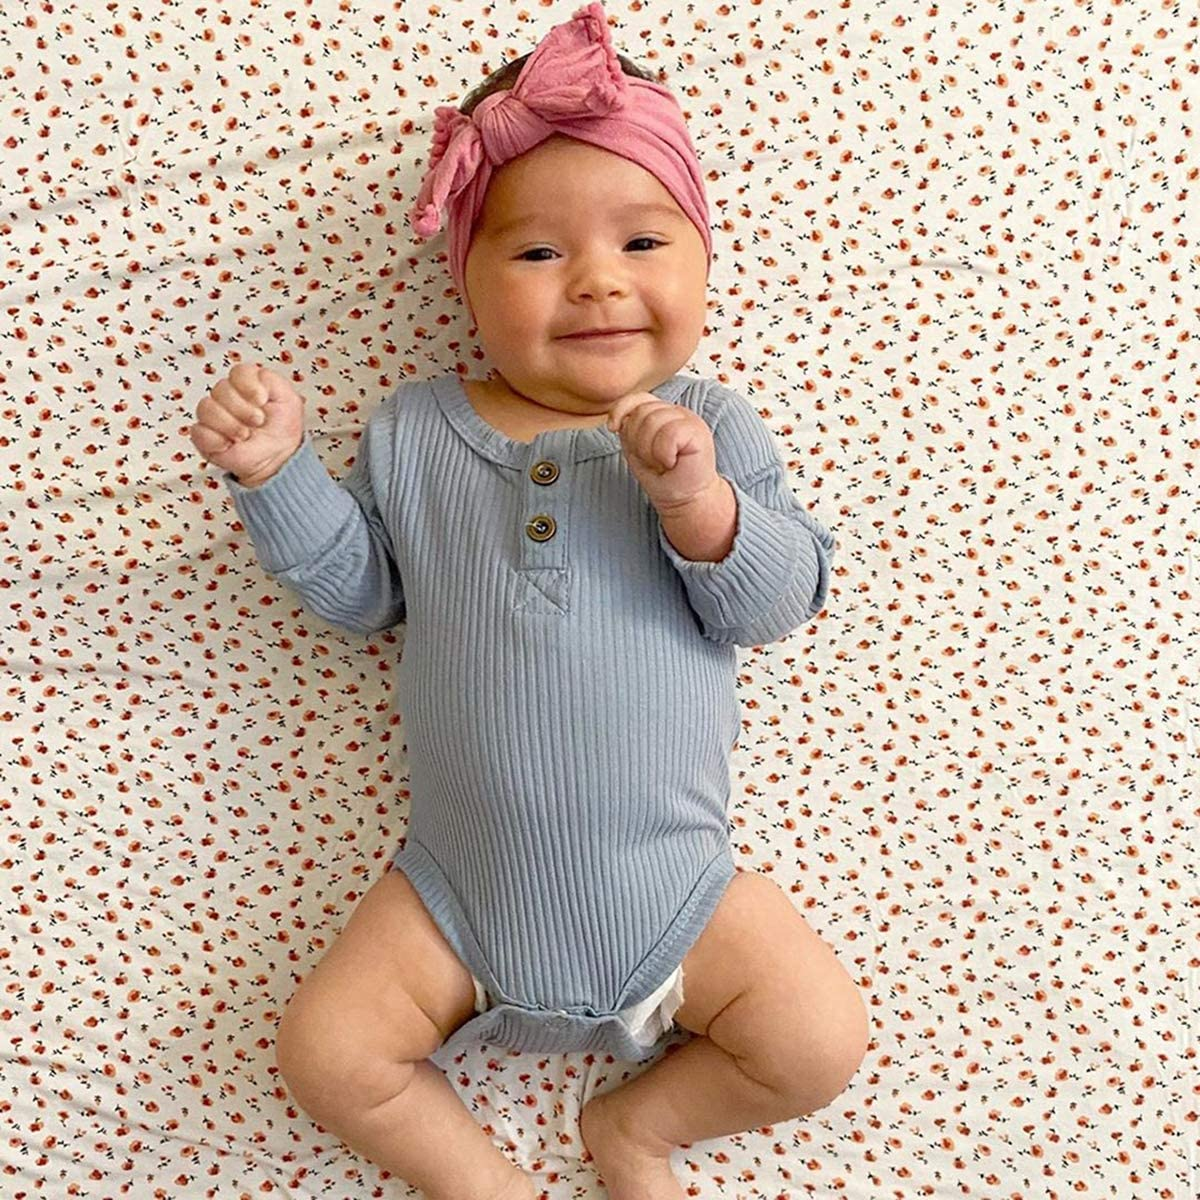 Neugeborene Unisex 2 St/ück Baby Kleidung Junge M/ädchen Solid Button Bodysuit Strampler Langarm Tops Kordelzug Hosen Strick Outfit